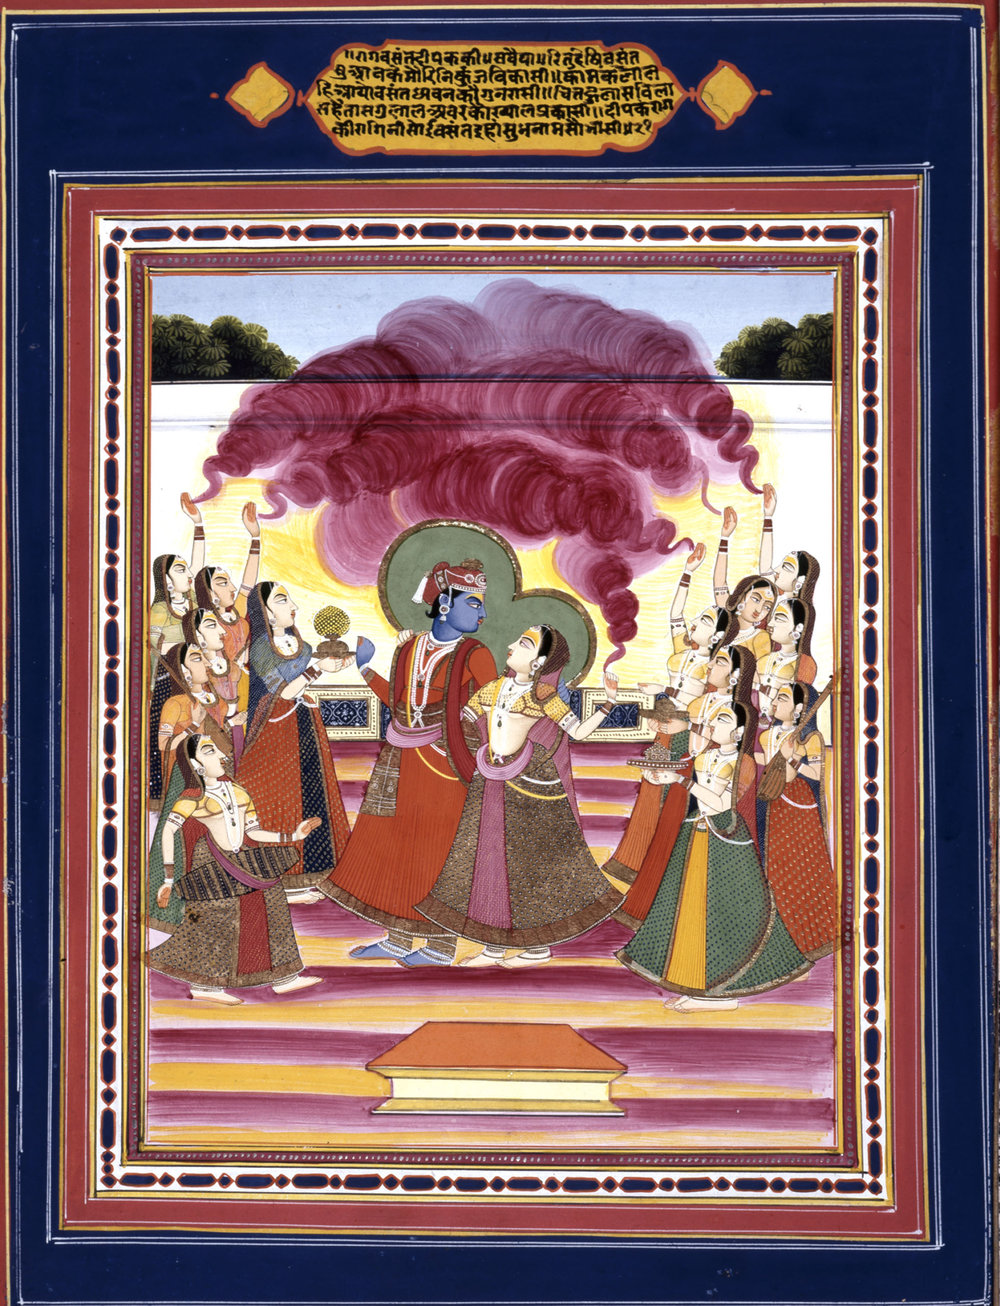 festival-of-color-krishna-radha.jpg